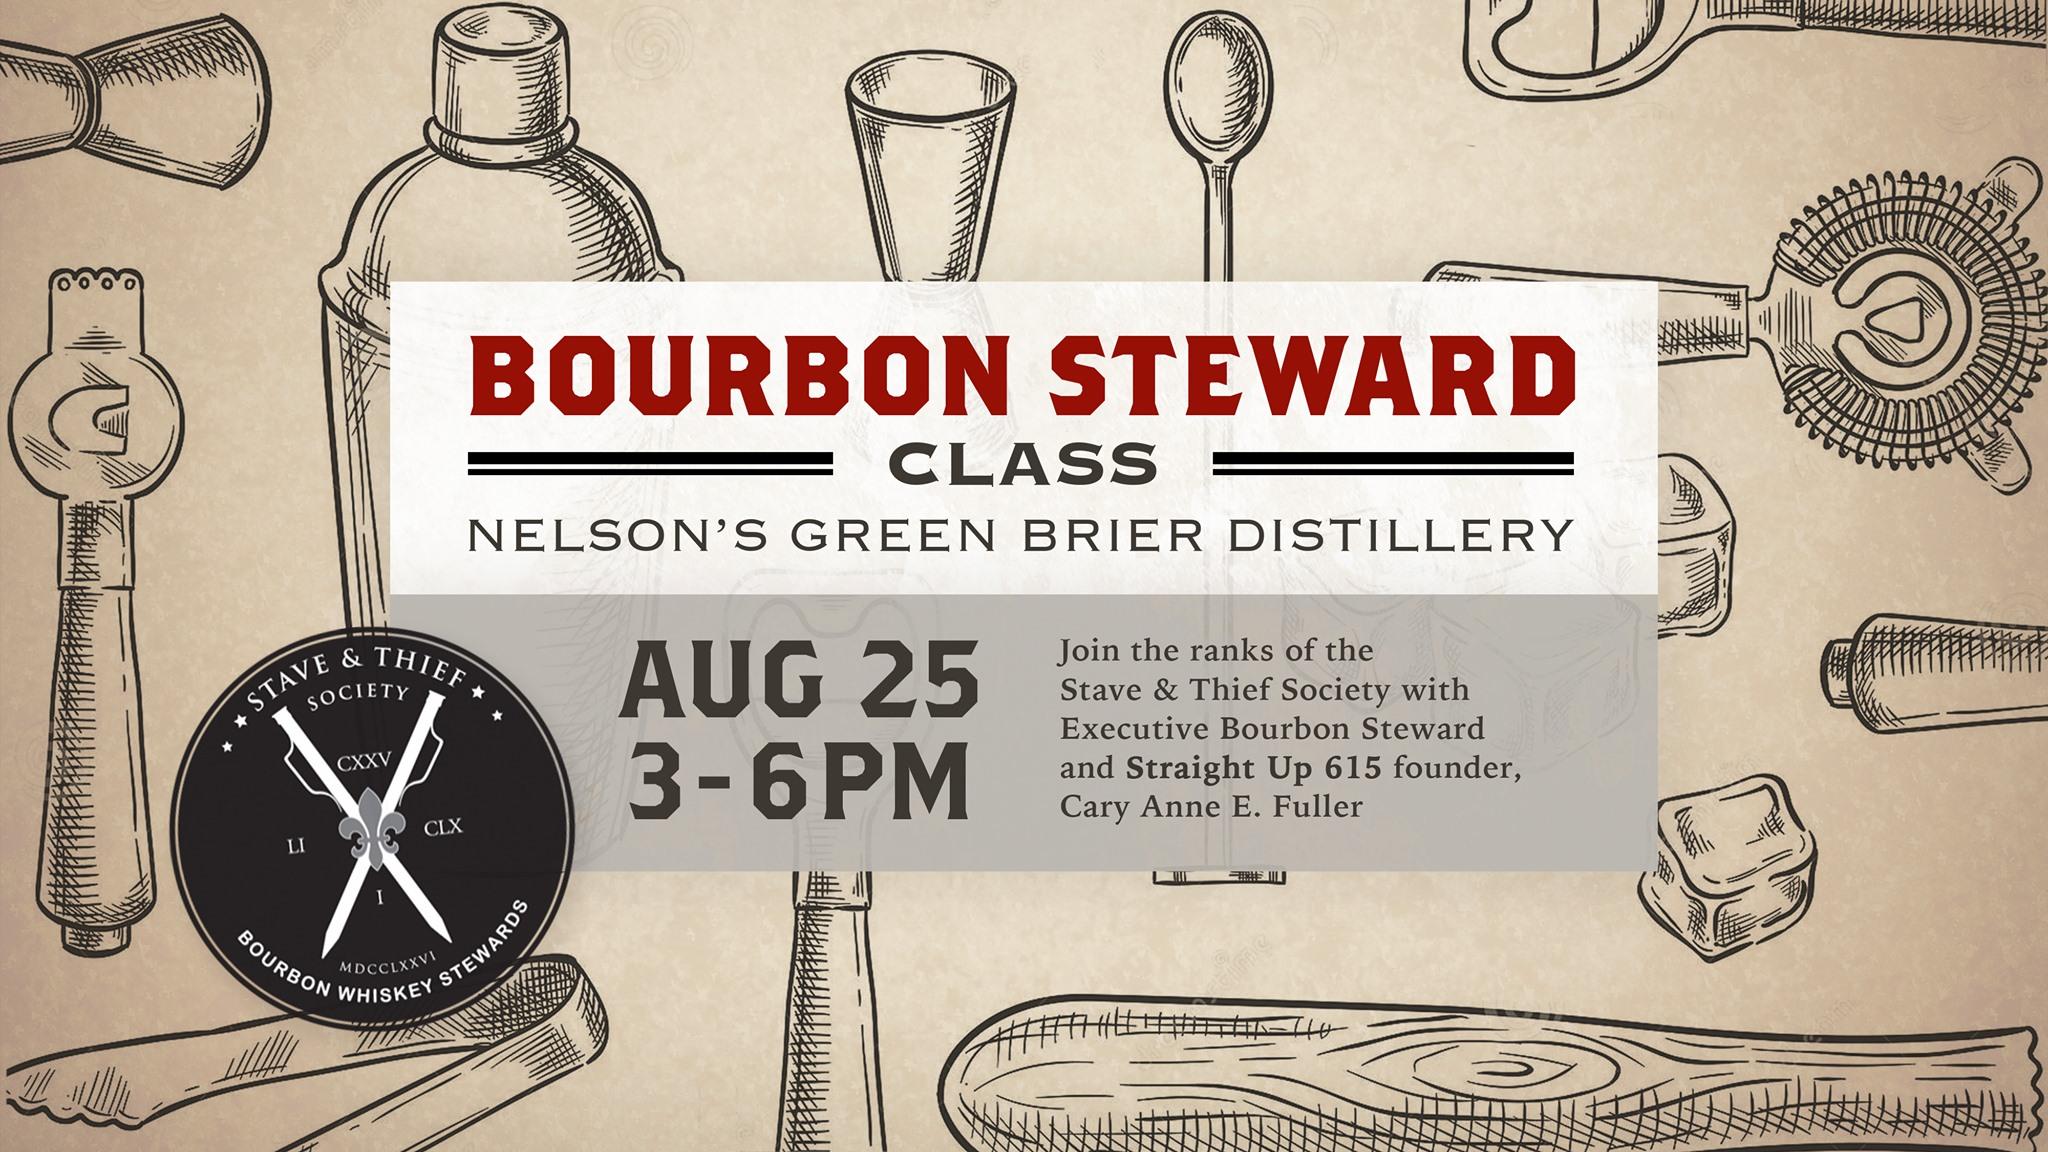 Bourbon Steward Certification